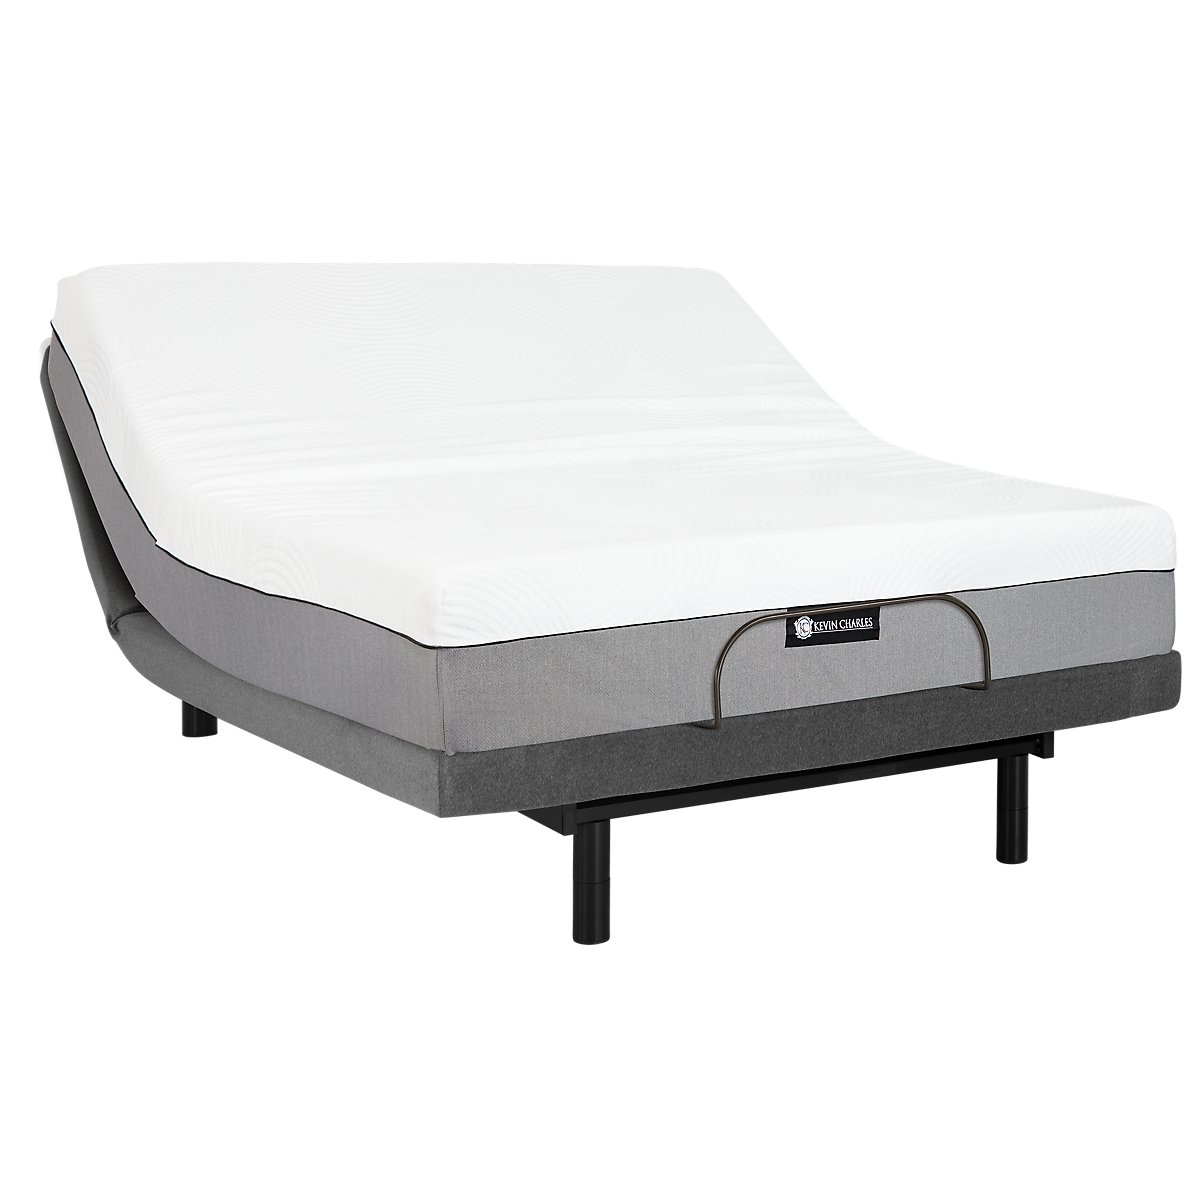 City Furniture Bliss Plush Memory Foam Select Adjustable Mattress Set